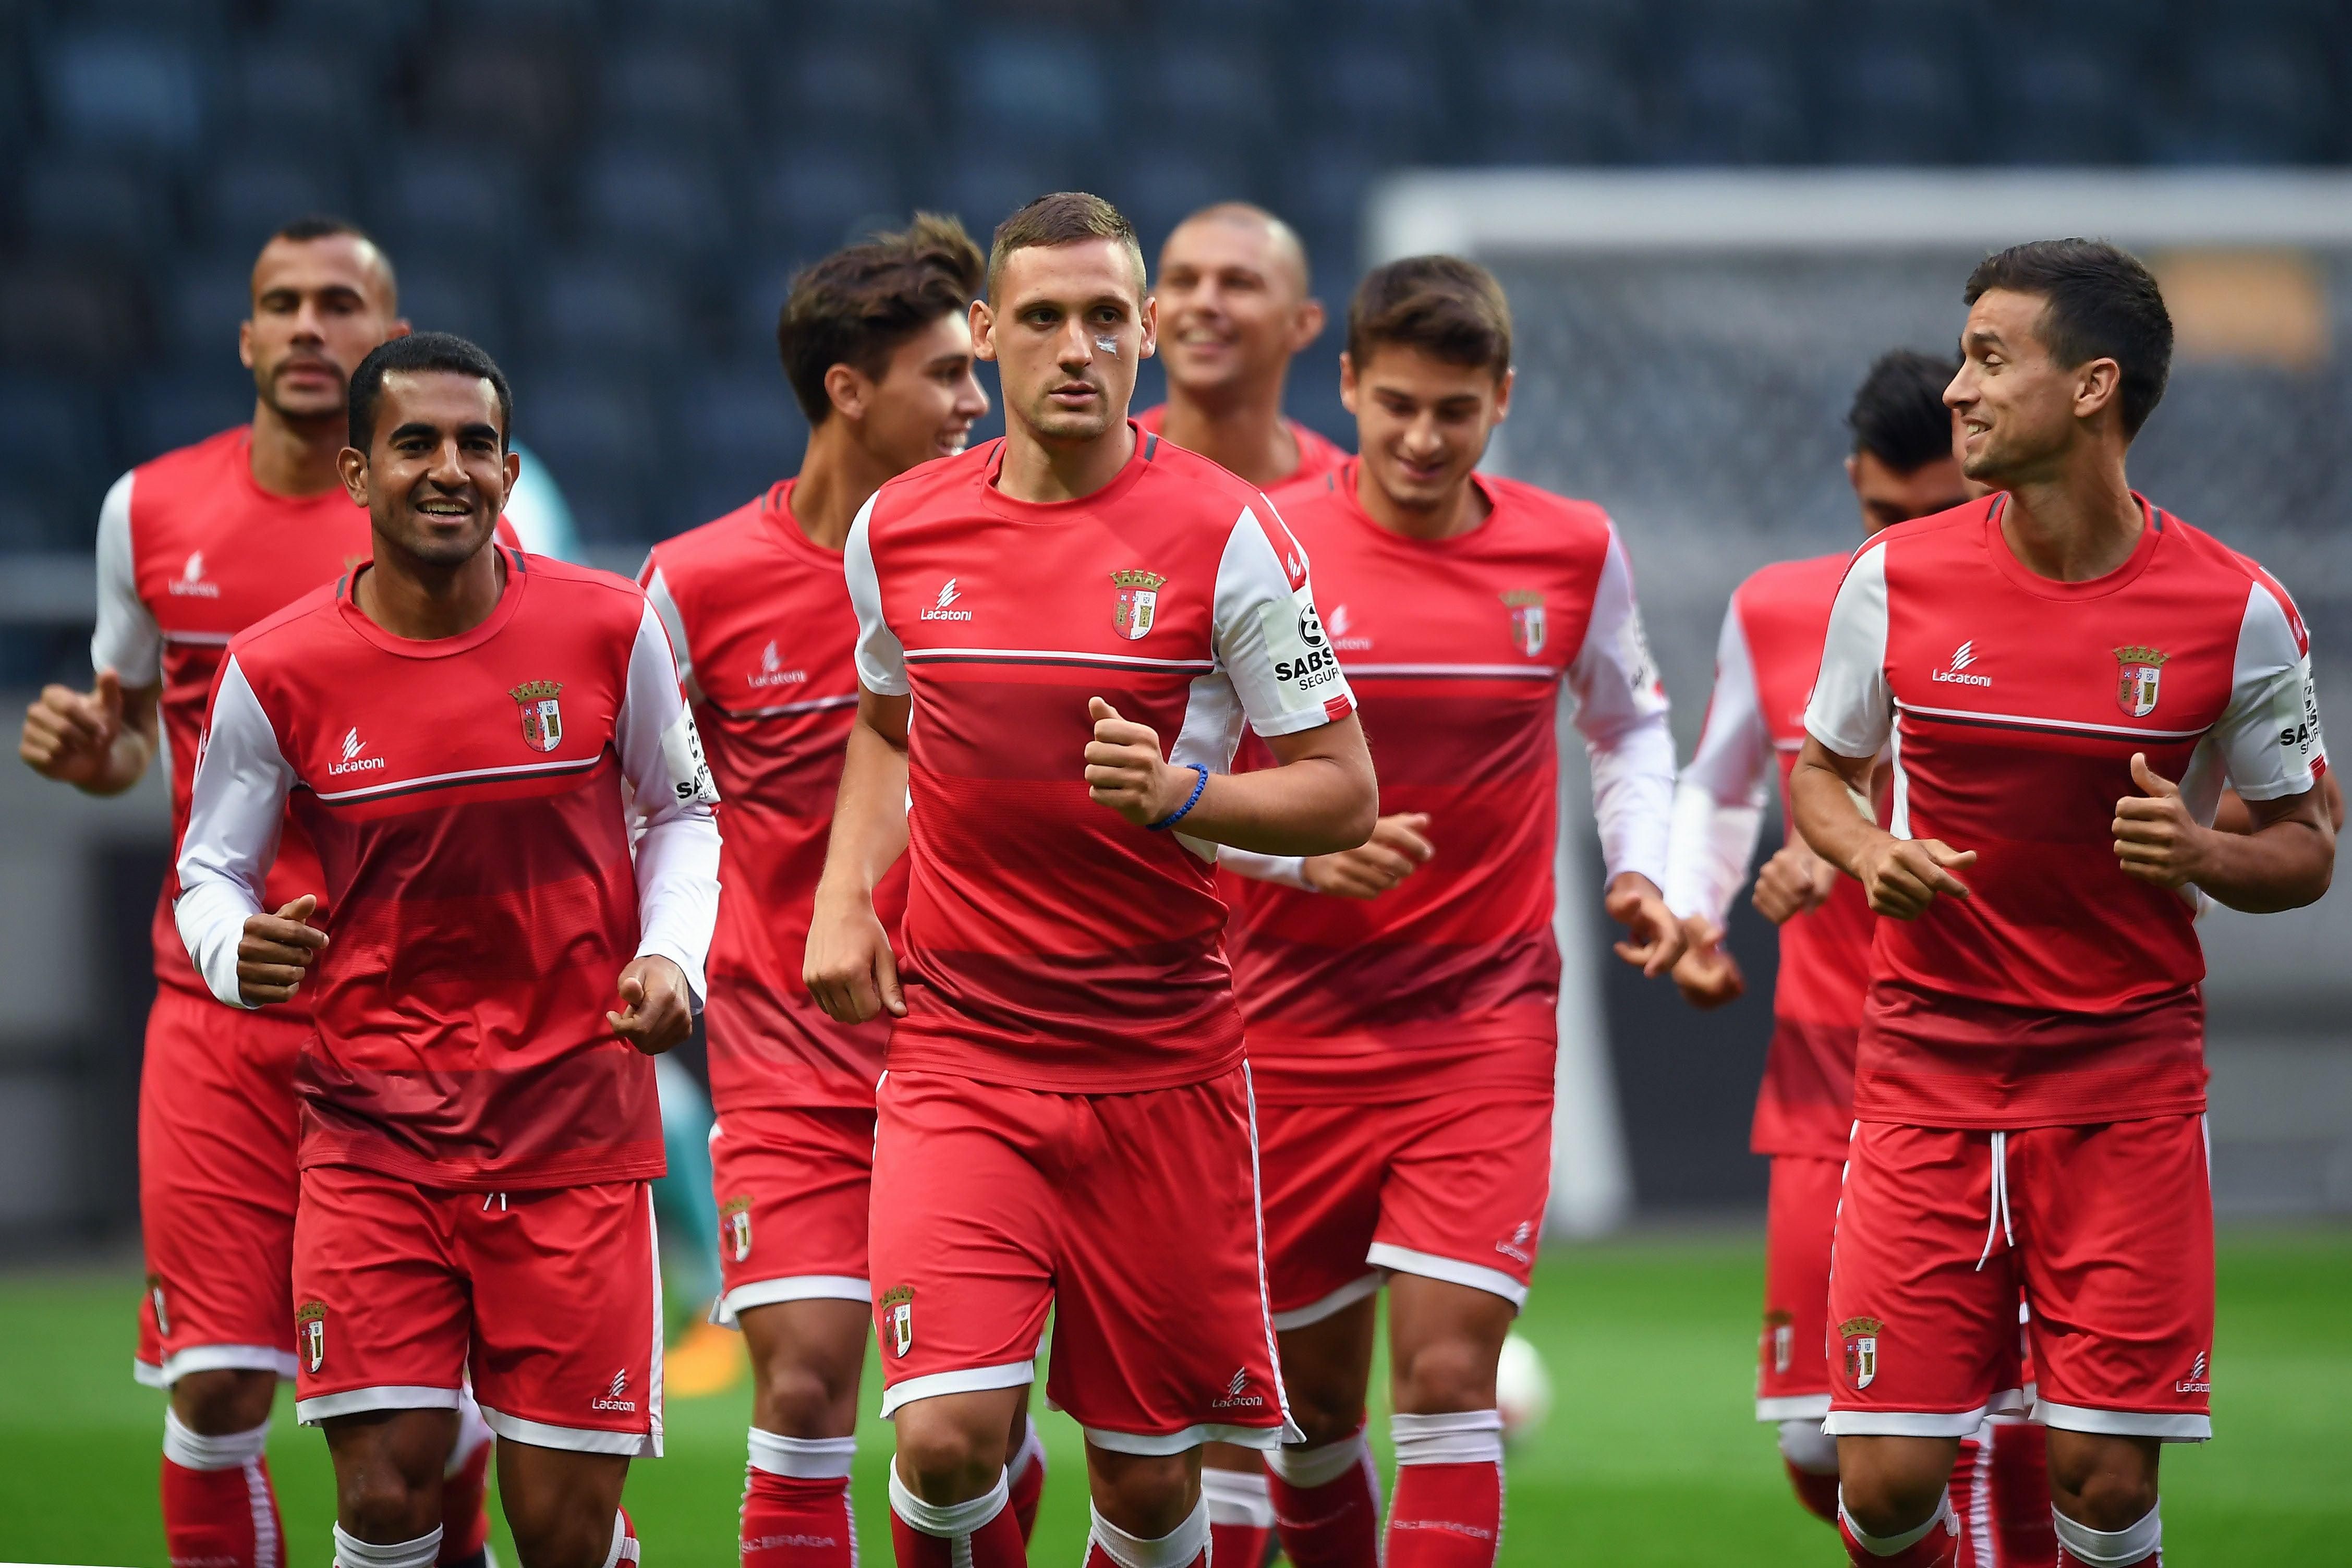 Sporting de Braga ruma ao play-off da Liga Europa